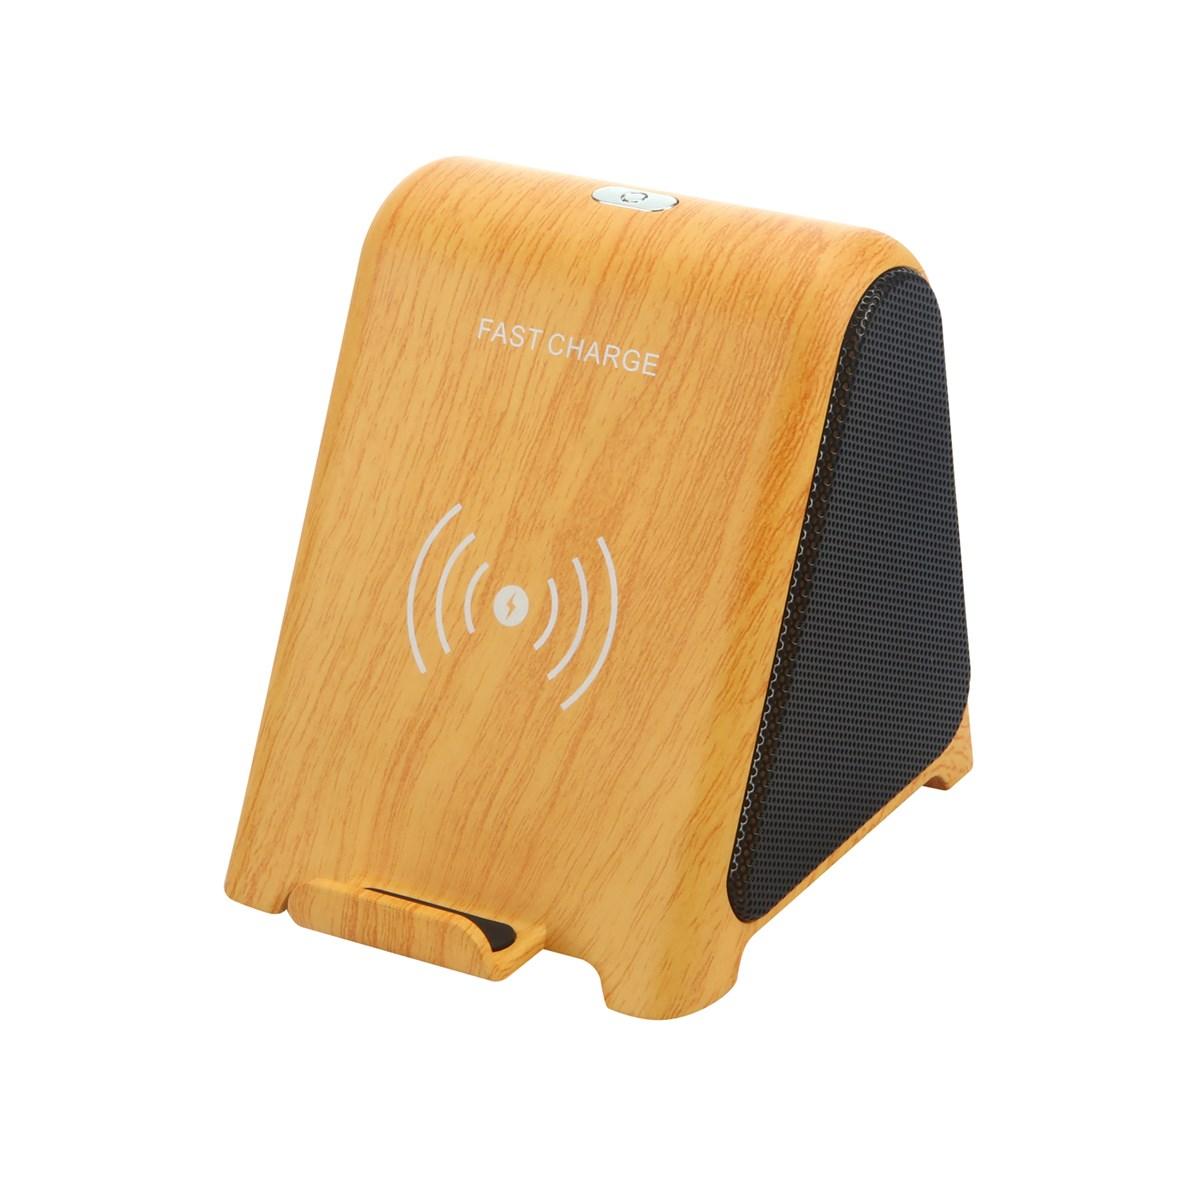 Wireless Bluetoothfilled audio